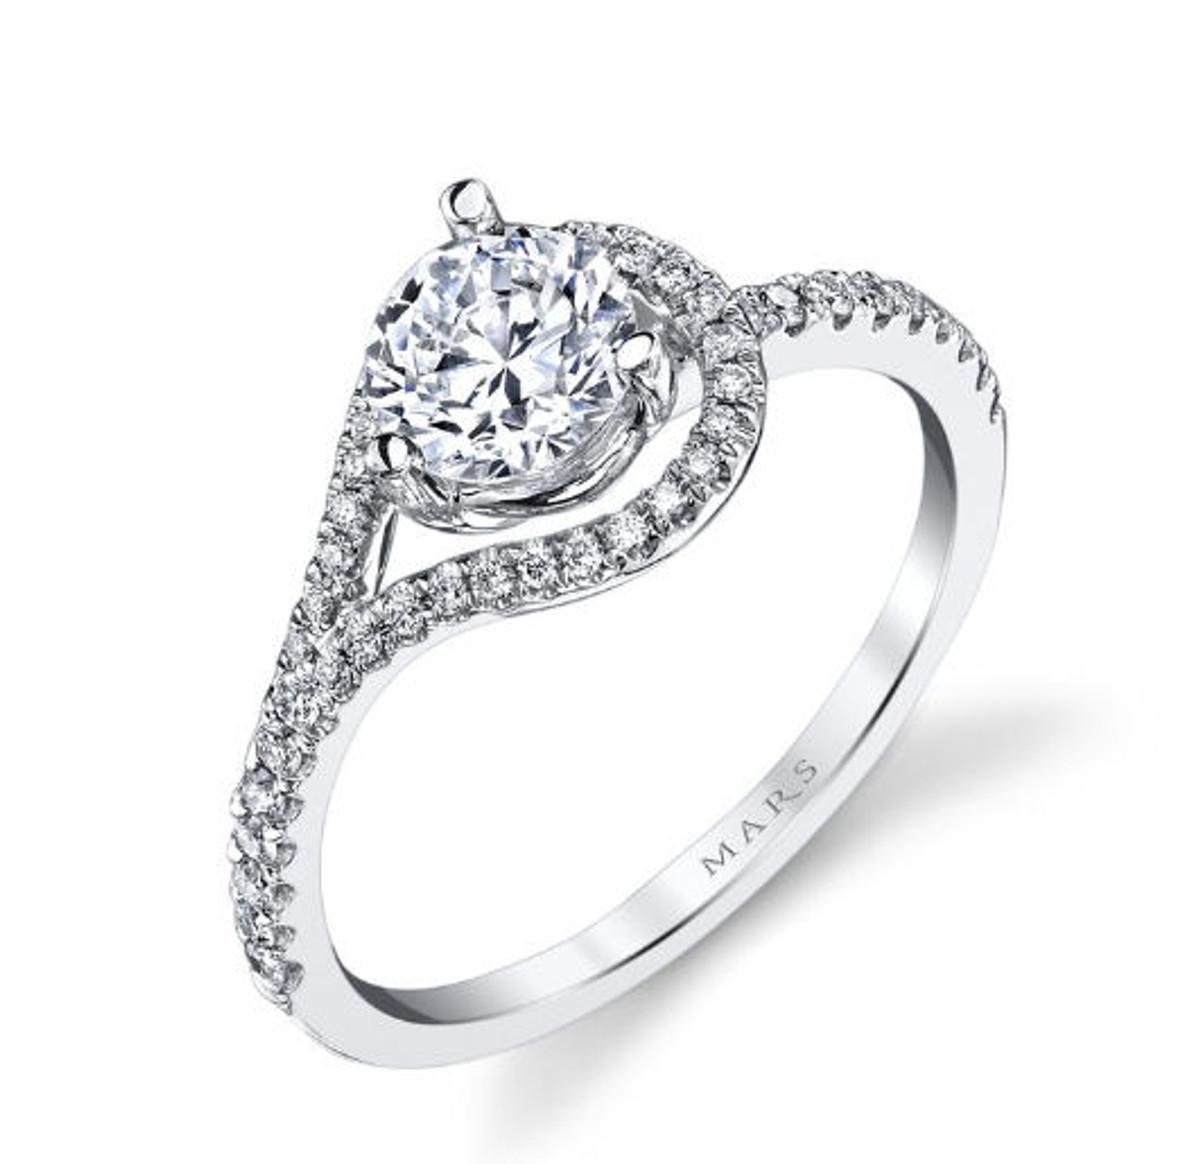 Asymmetric Infinity Diamond Engagement Ring